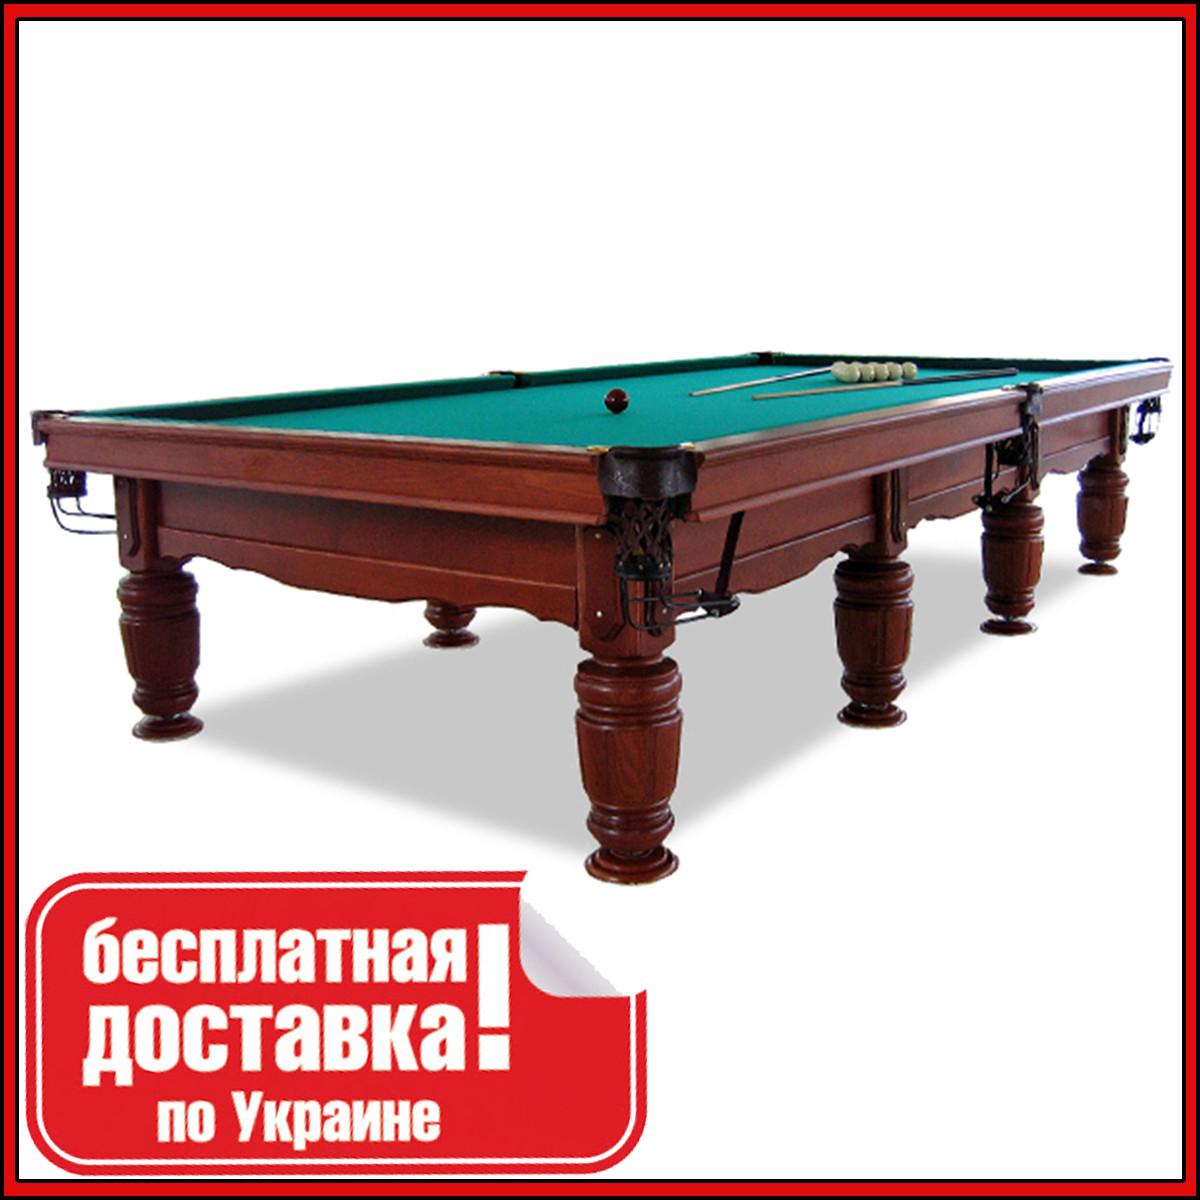 Бильярдный стол для пула Виват 9 футов Ардезия 2.6 м х 1.3 м из натурального дерева